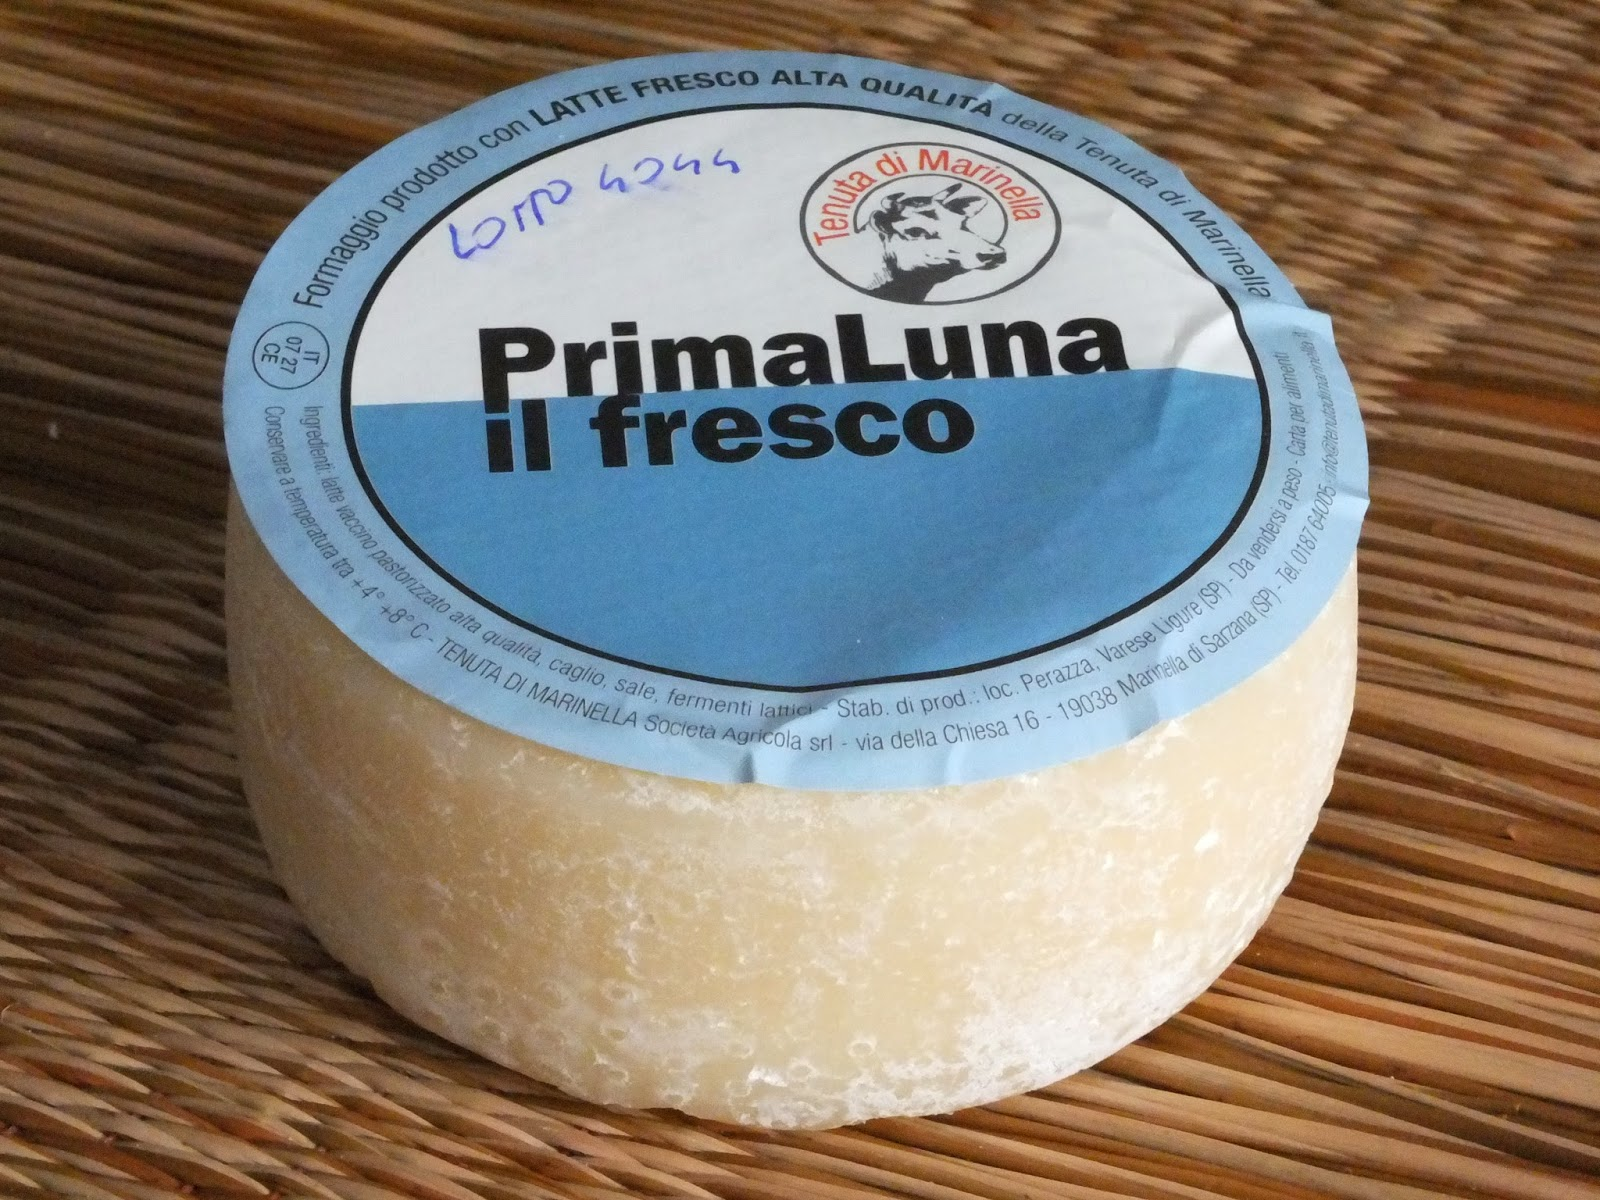 Fresh cheese from the plains of Luni.  Tenuta di Marinella